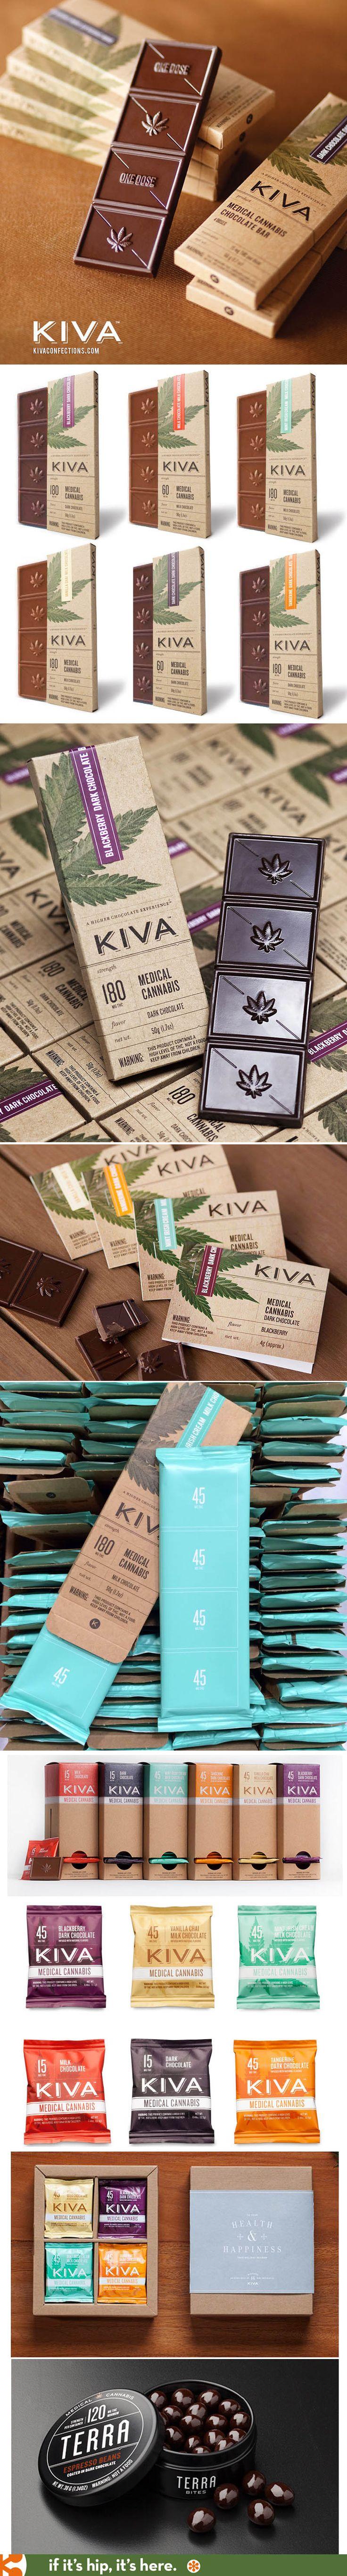 Kiva chocolate very tasty!